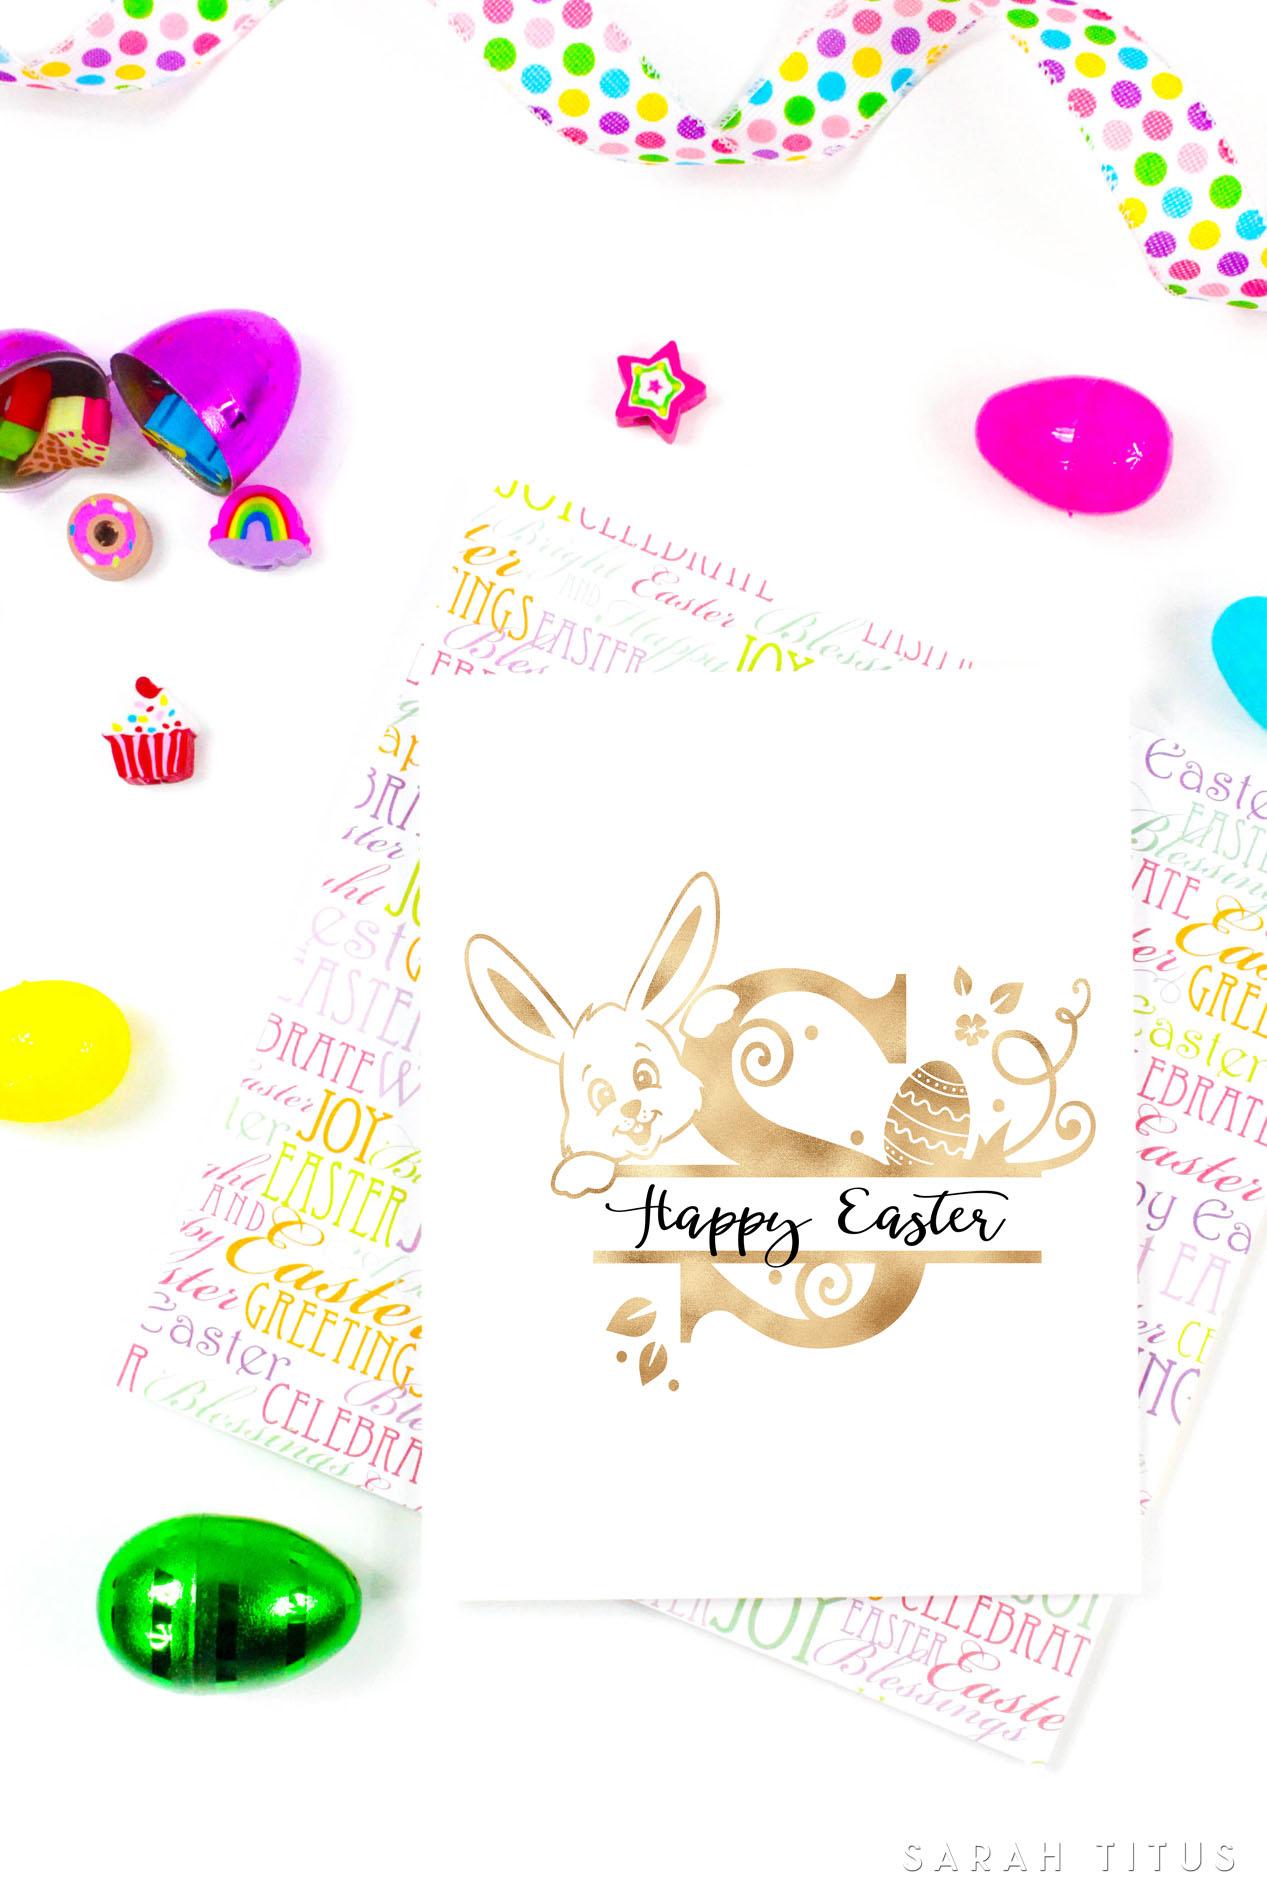 Free Printable Easter Monogram Signs - Sarah Titus - Free Printable Easter Decorations